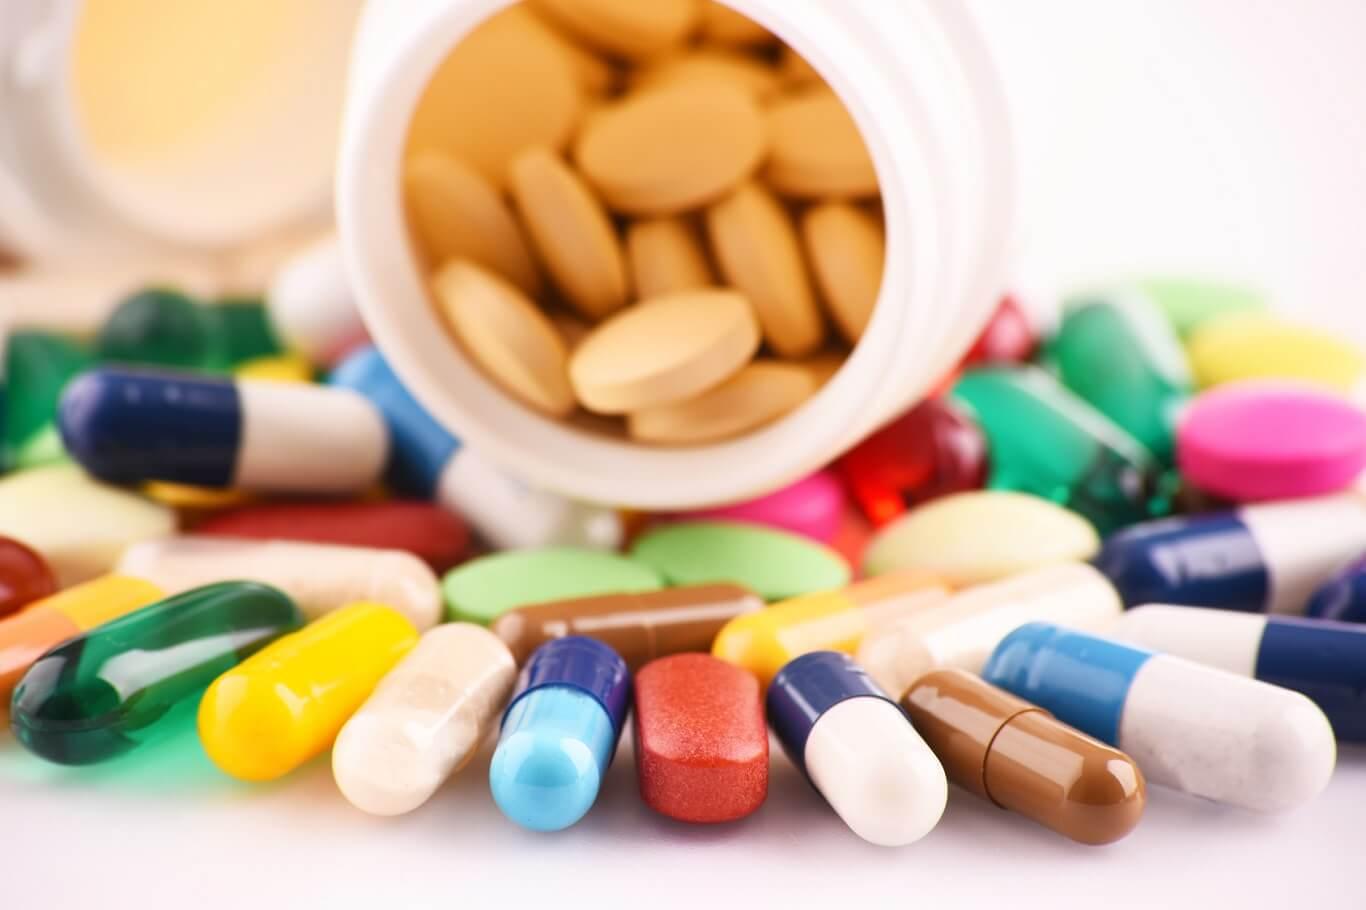 wrong medication lawsuit settlement